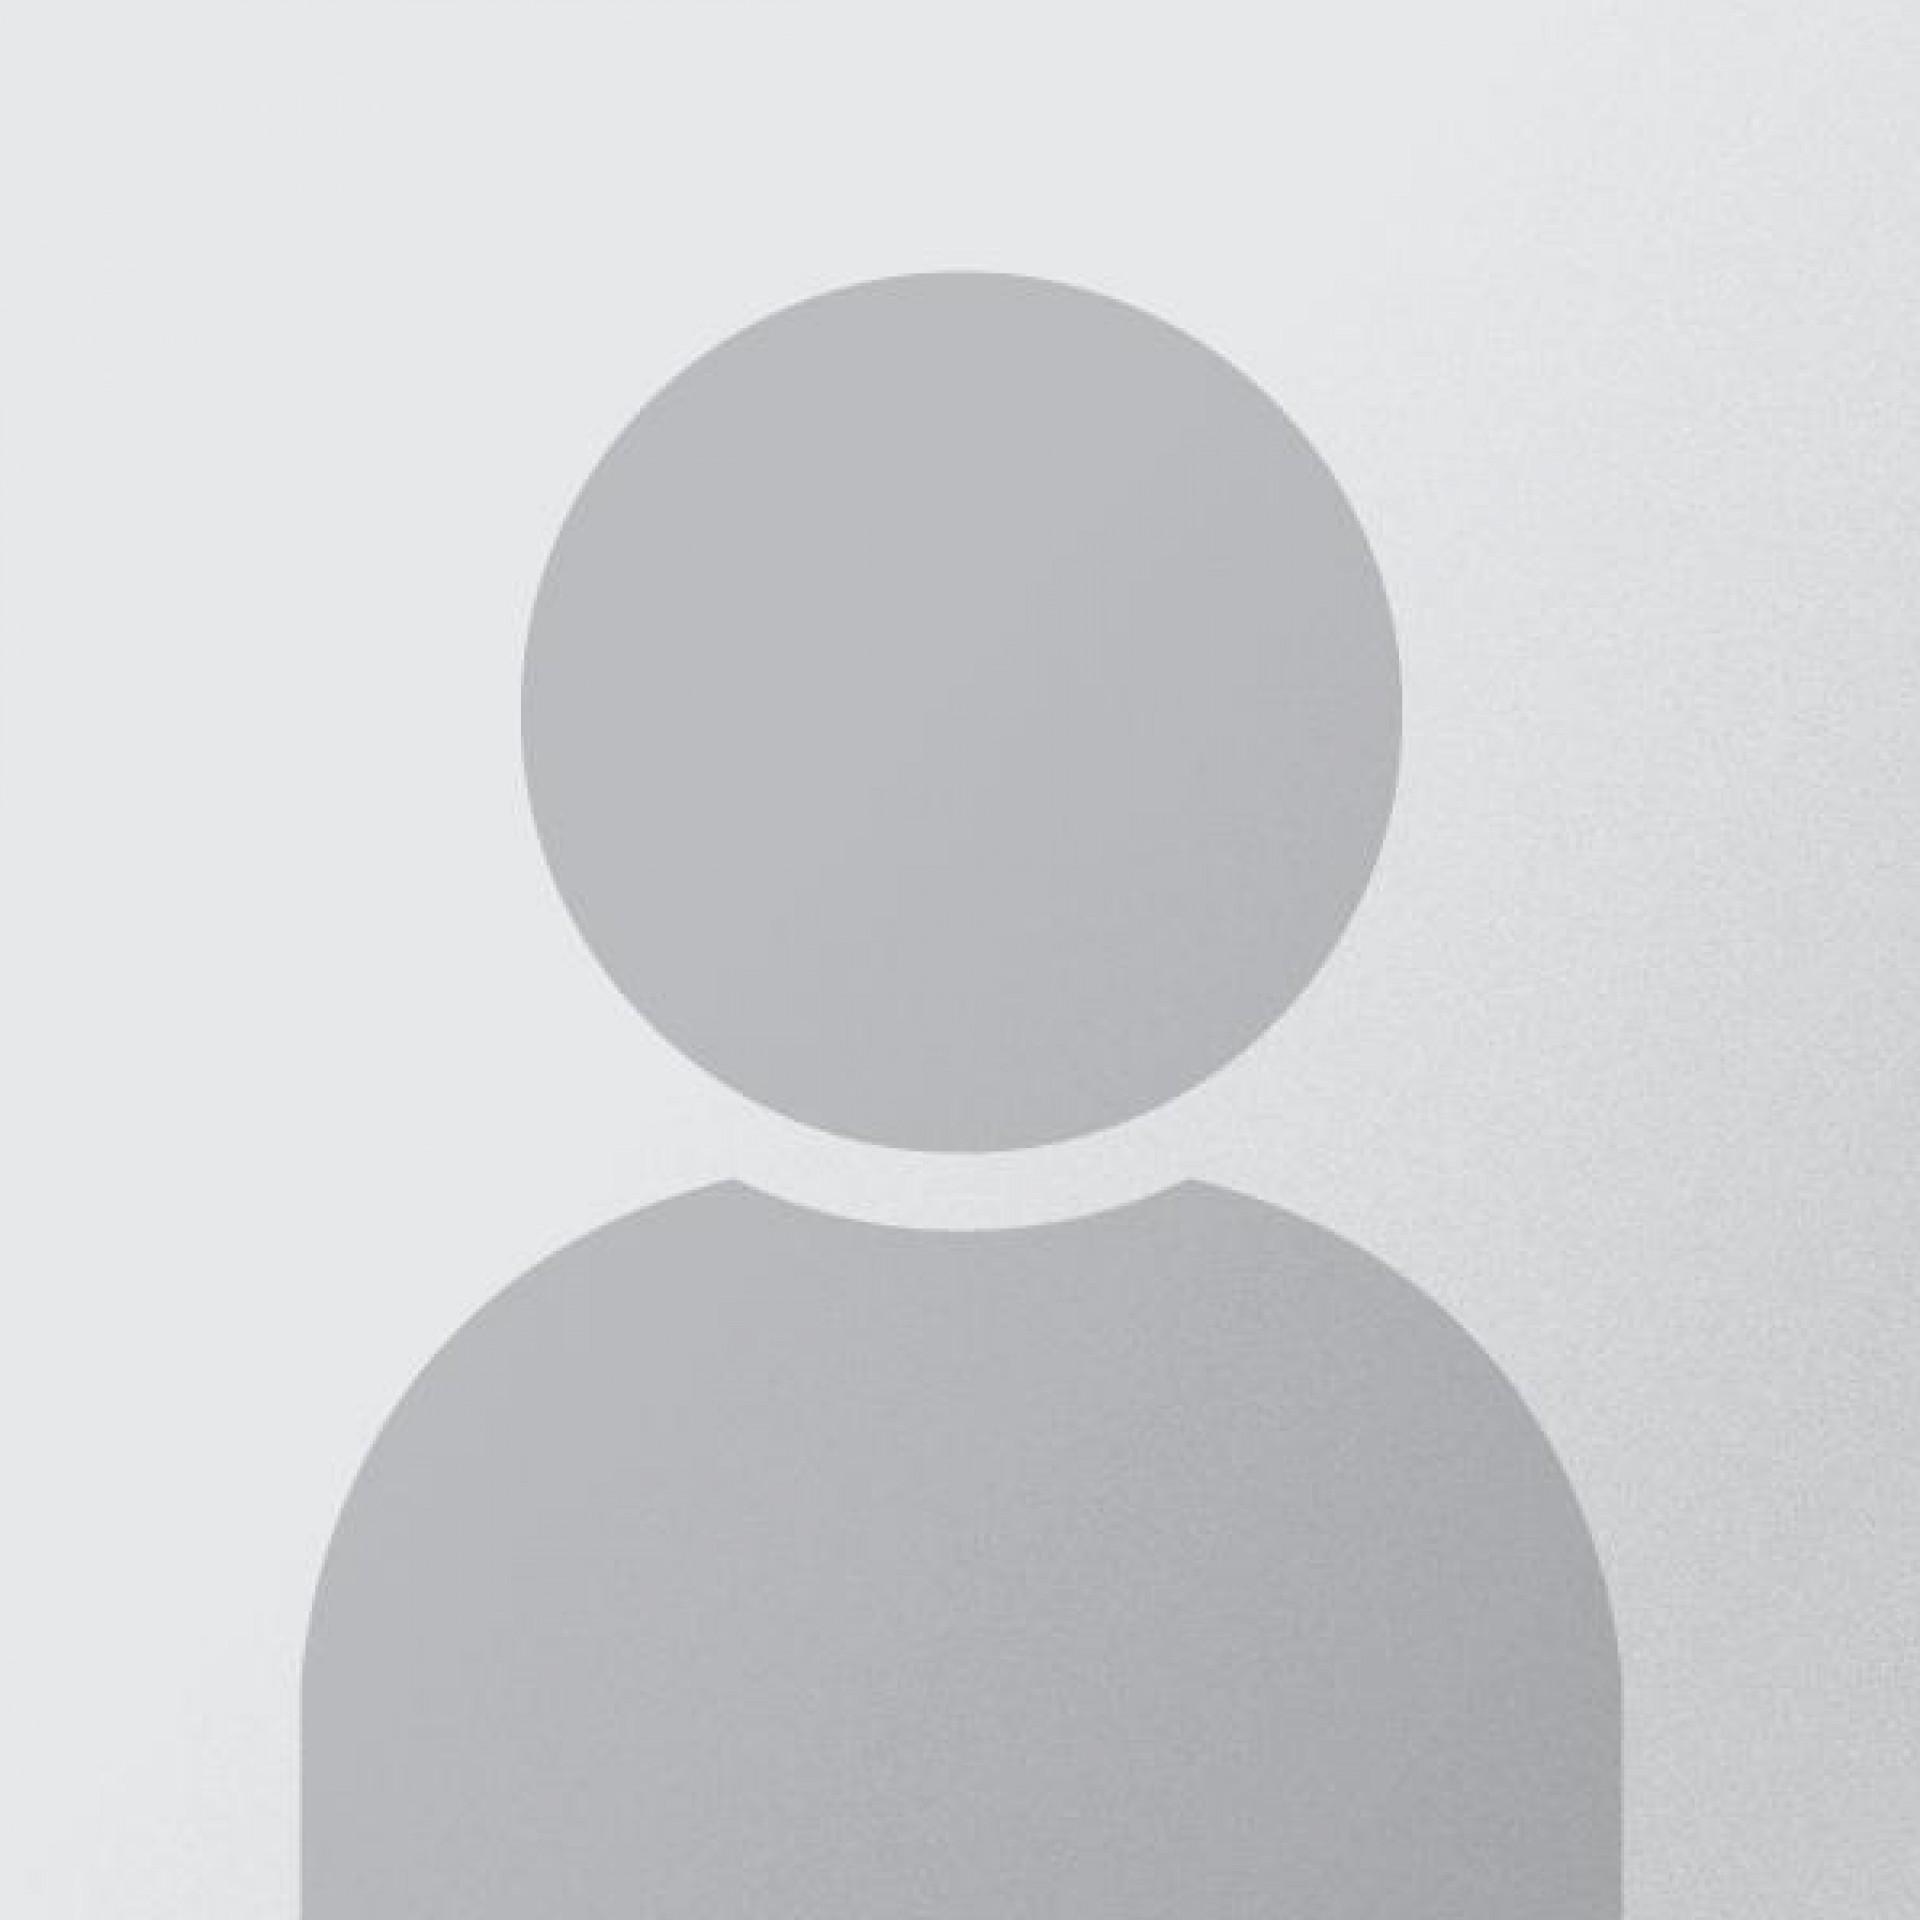 fotografia p021 profilu 0102HPO47X